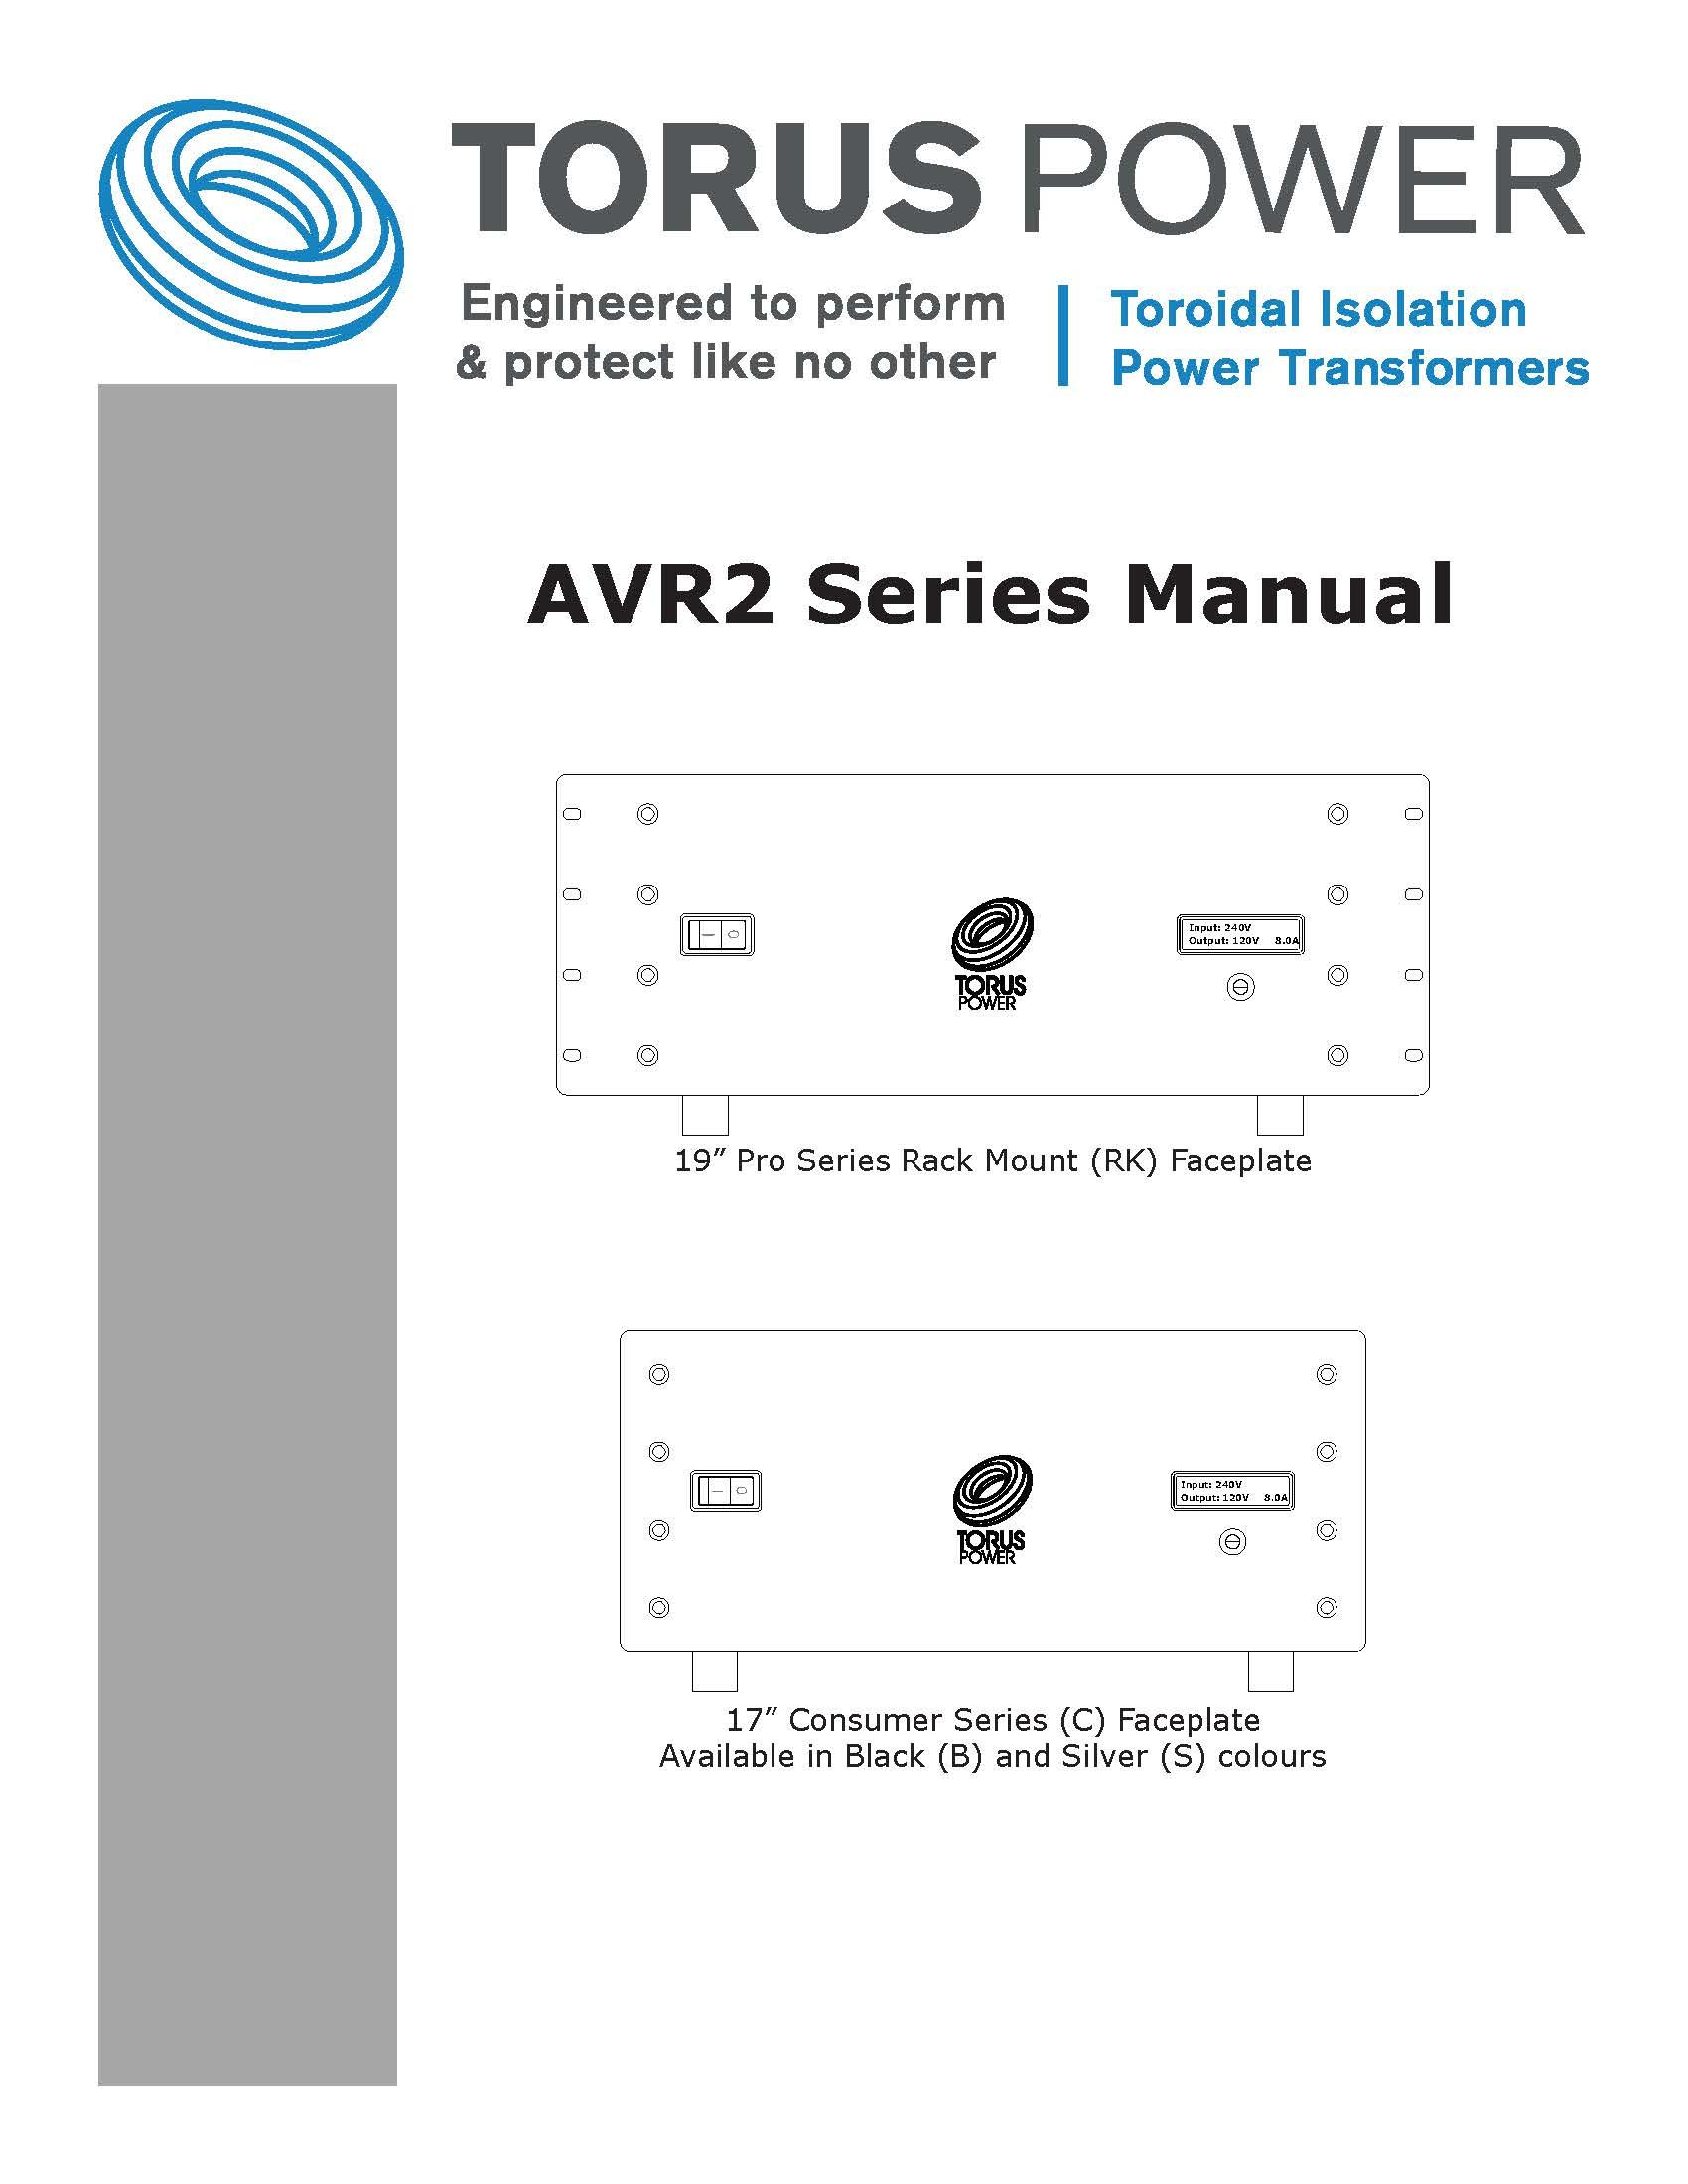 AVR2 Manual